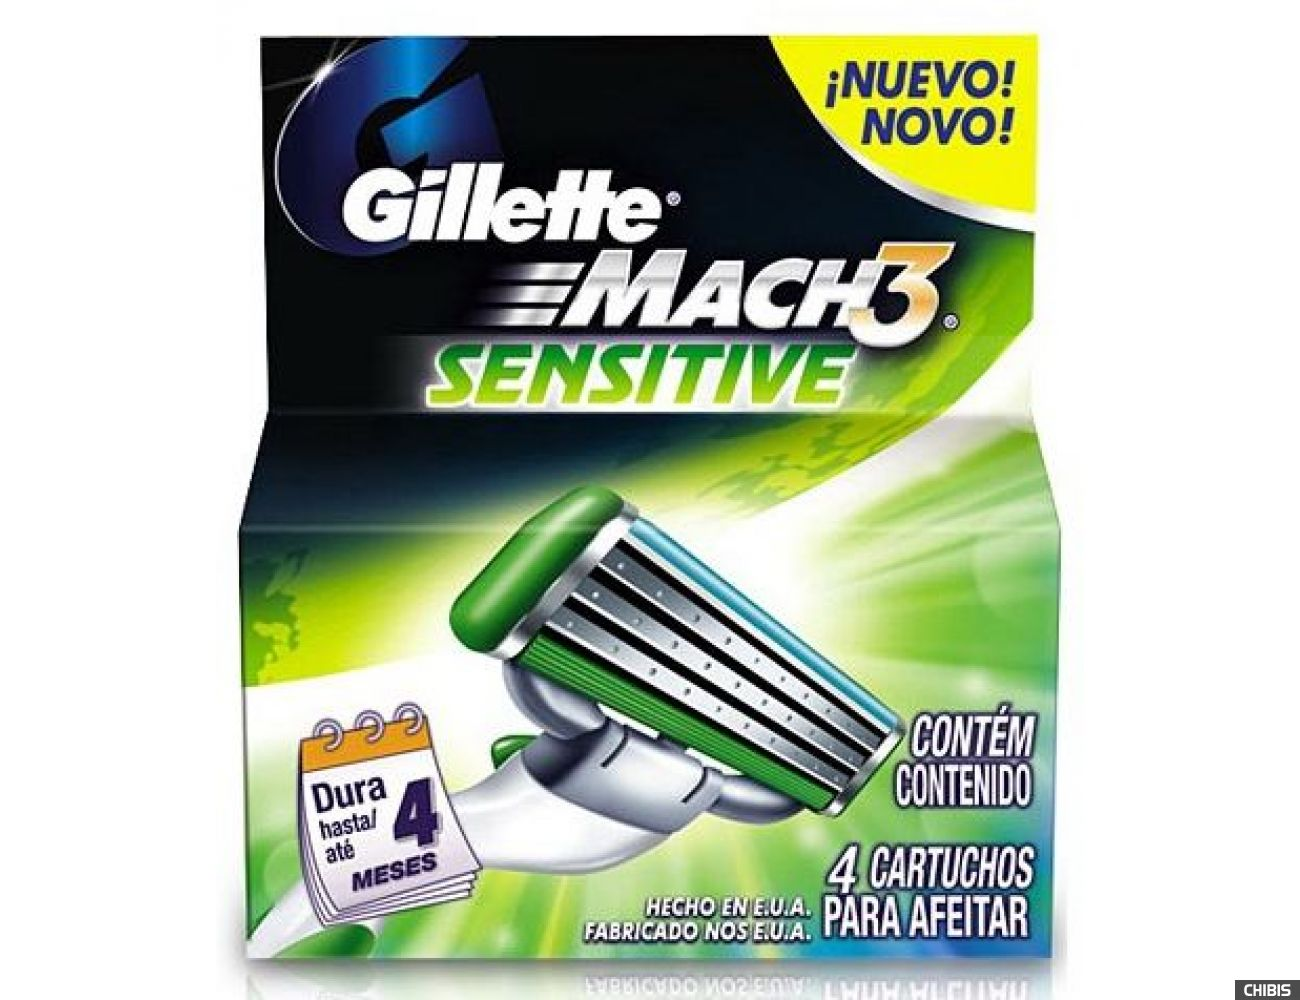 Gillette Mach3 Sensitive лезвия для станка 4 шт. 7702018037896